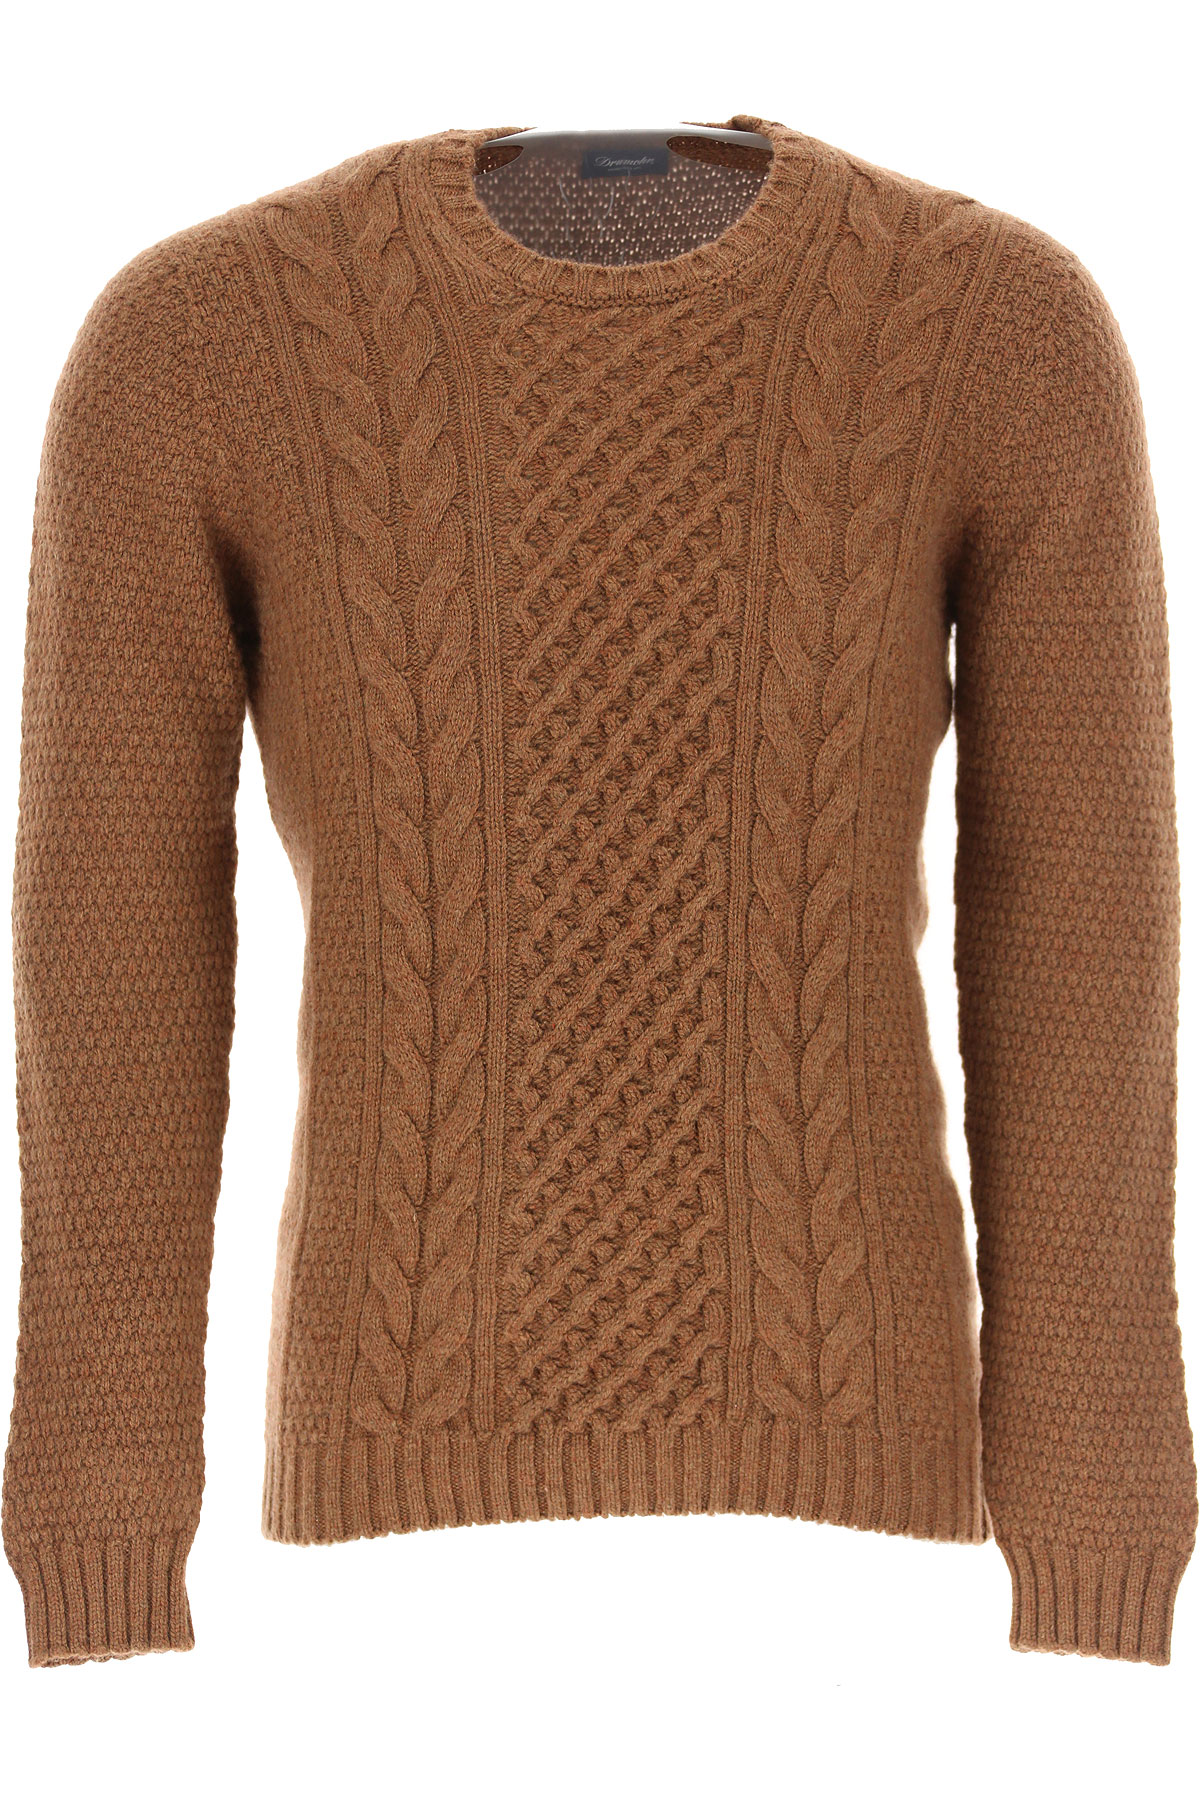 Drumohr Sweater for Men Jumper, Brown, Lambswool, 2019, XL XXL